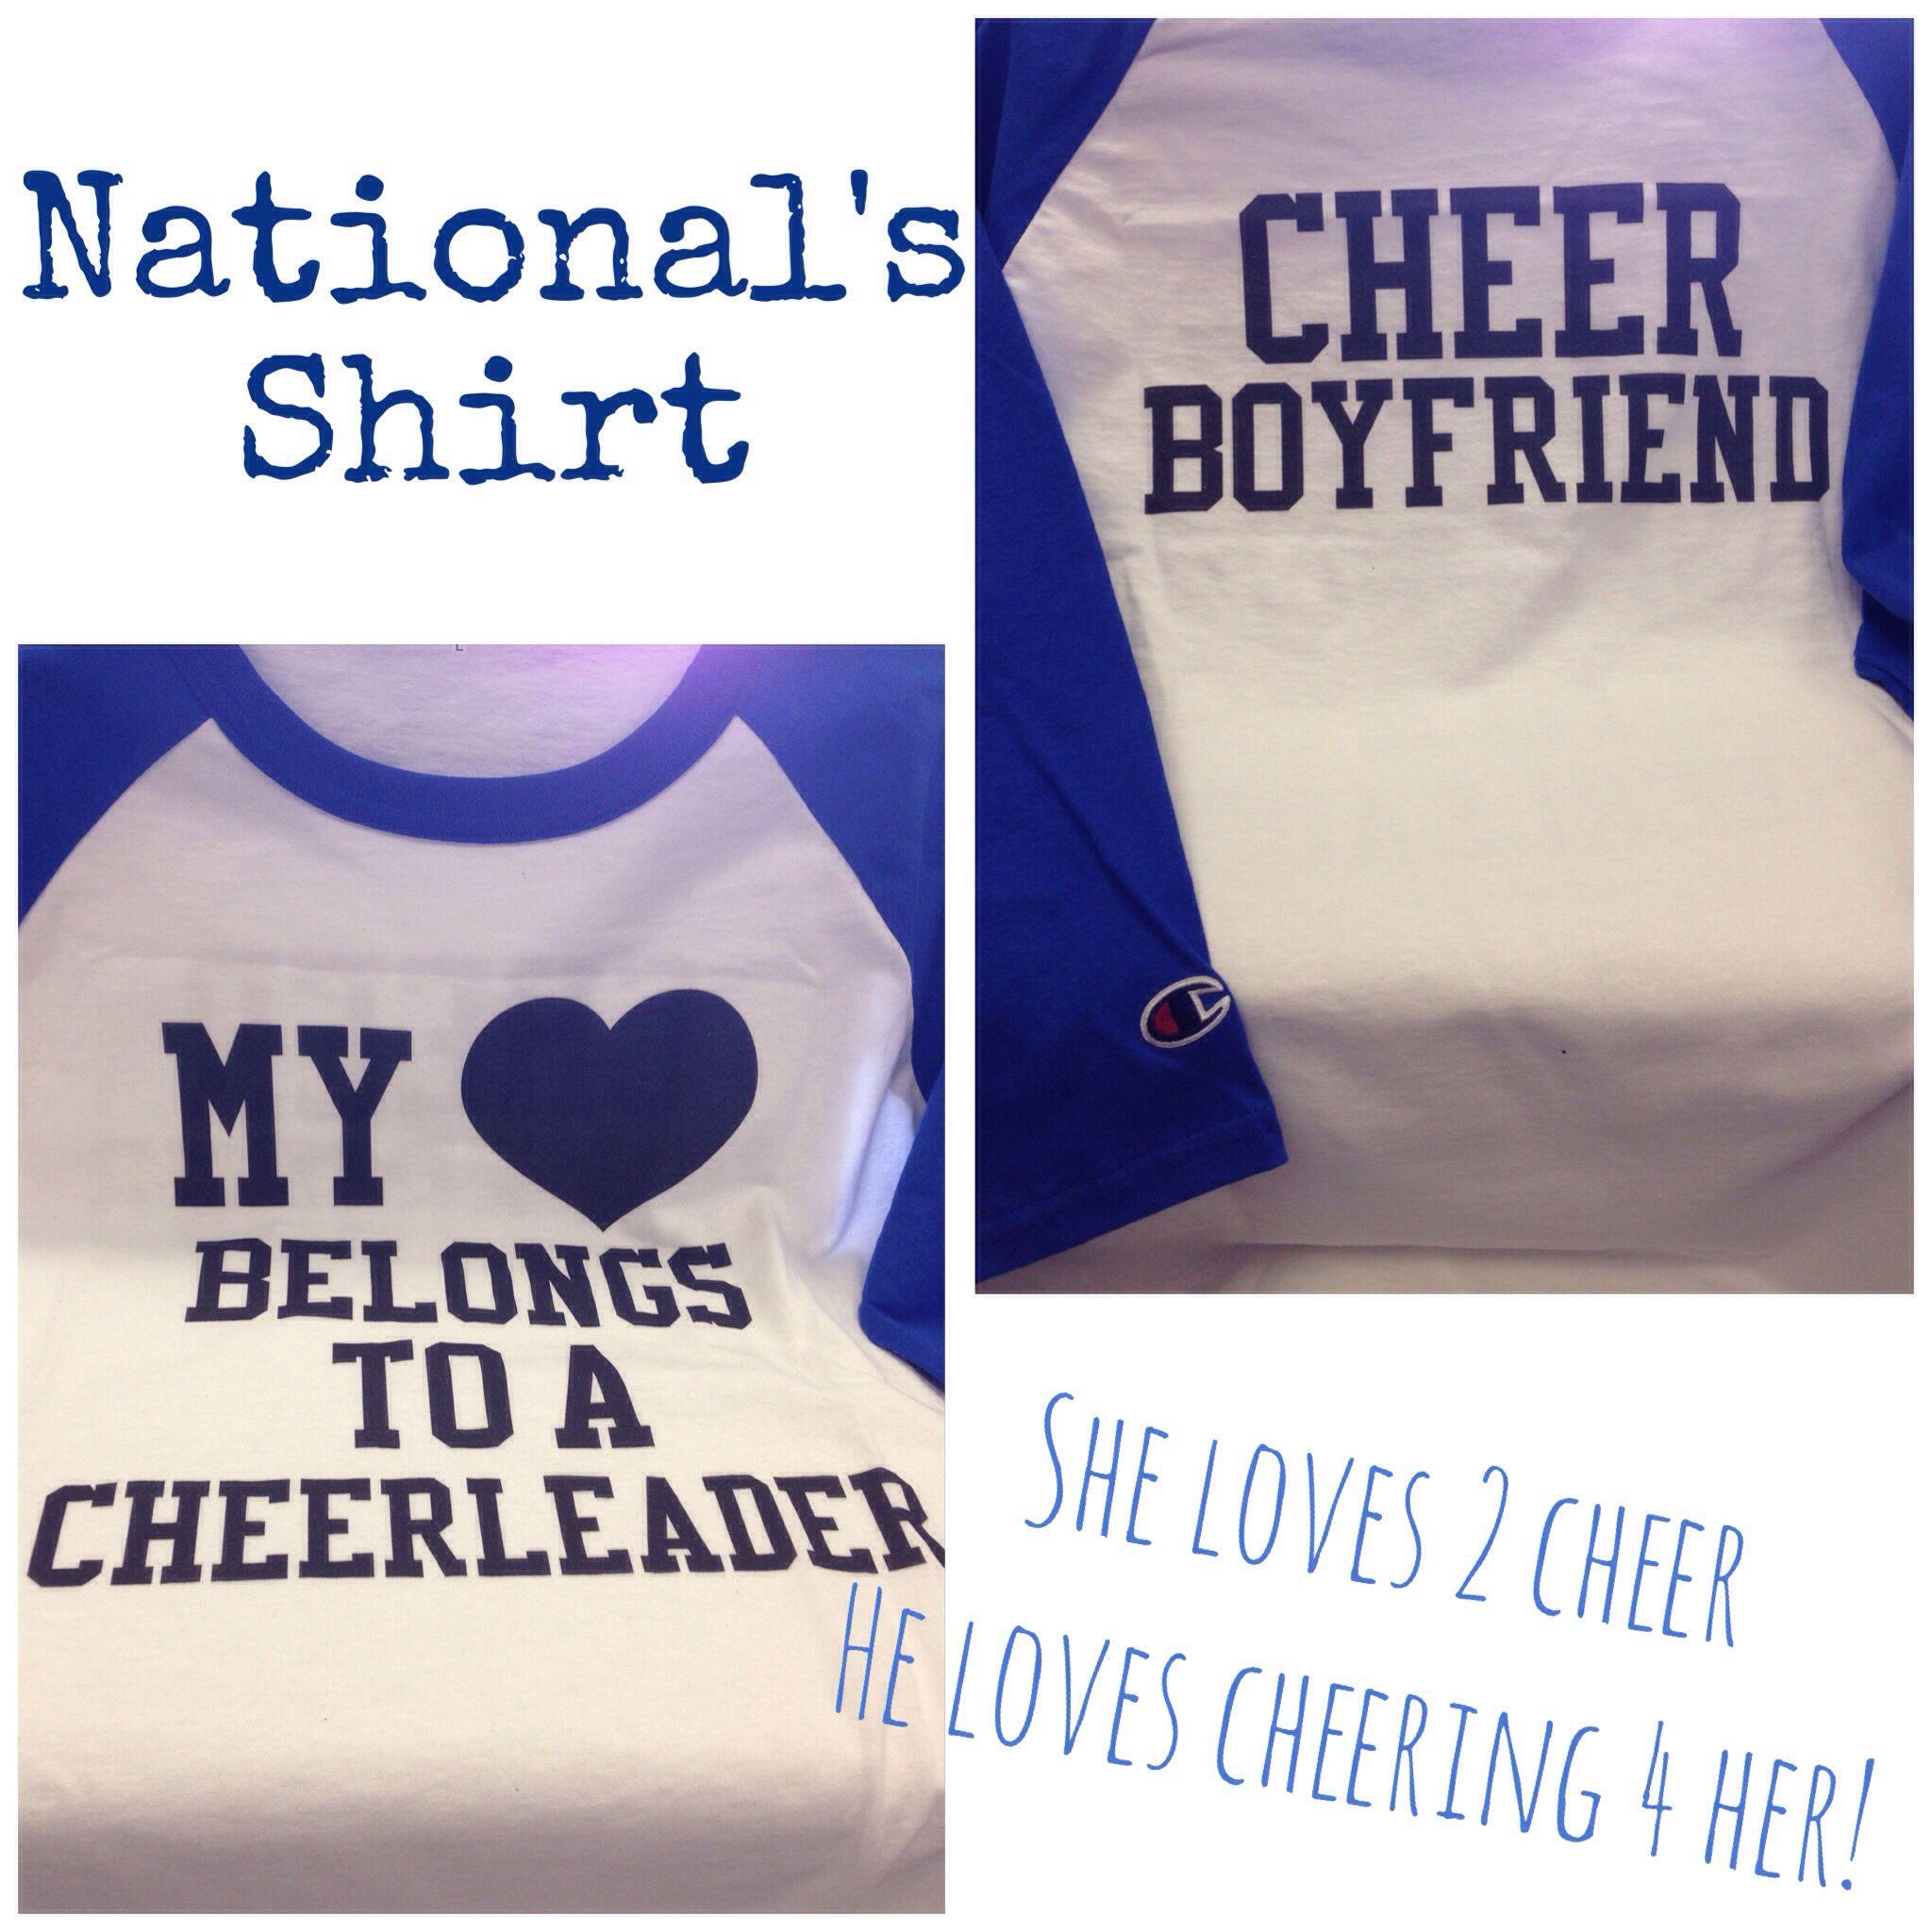 218e5fe839 My daughter's boyfriend shirt! Cute! #cheerleading #cheerboyfriend  #mycreativeshirtideas